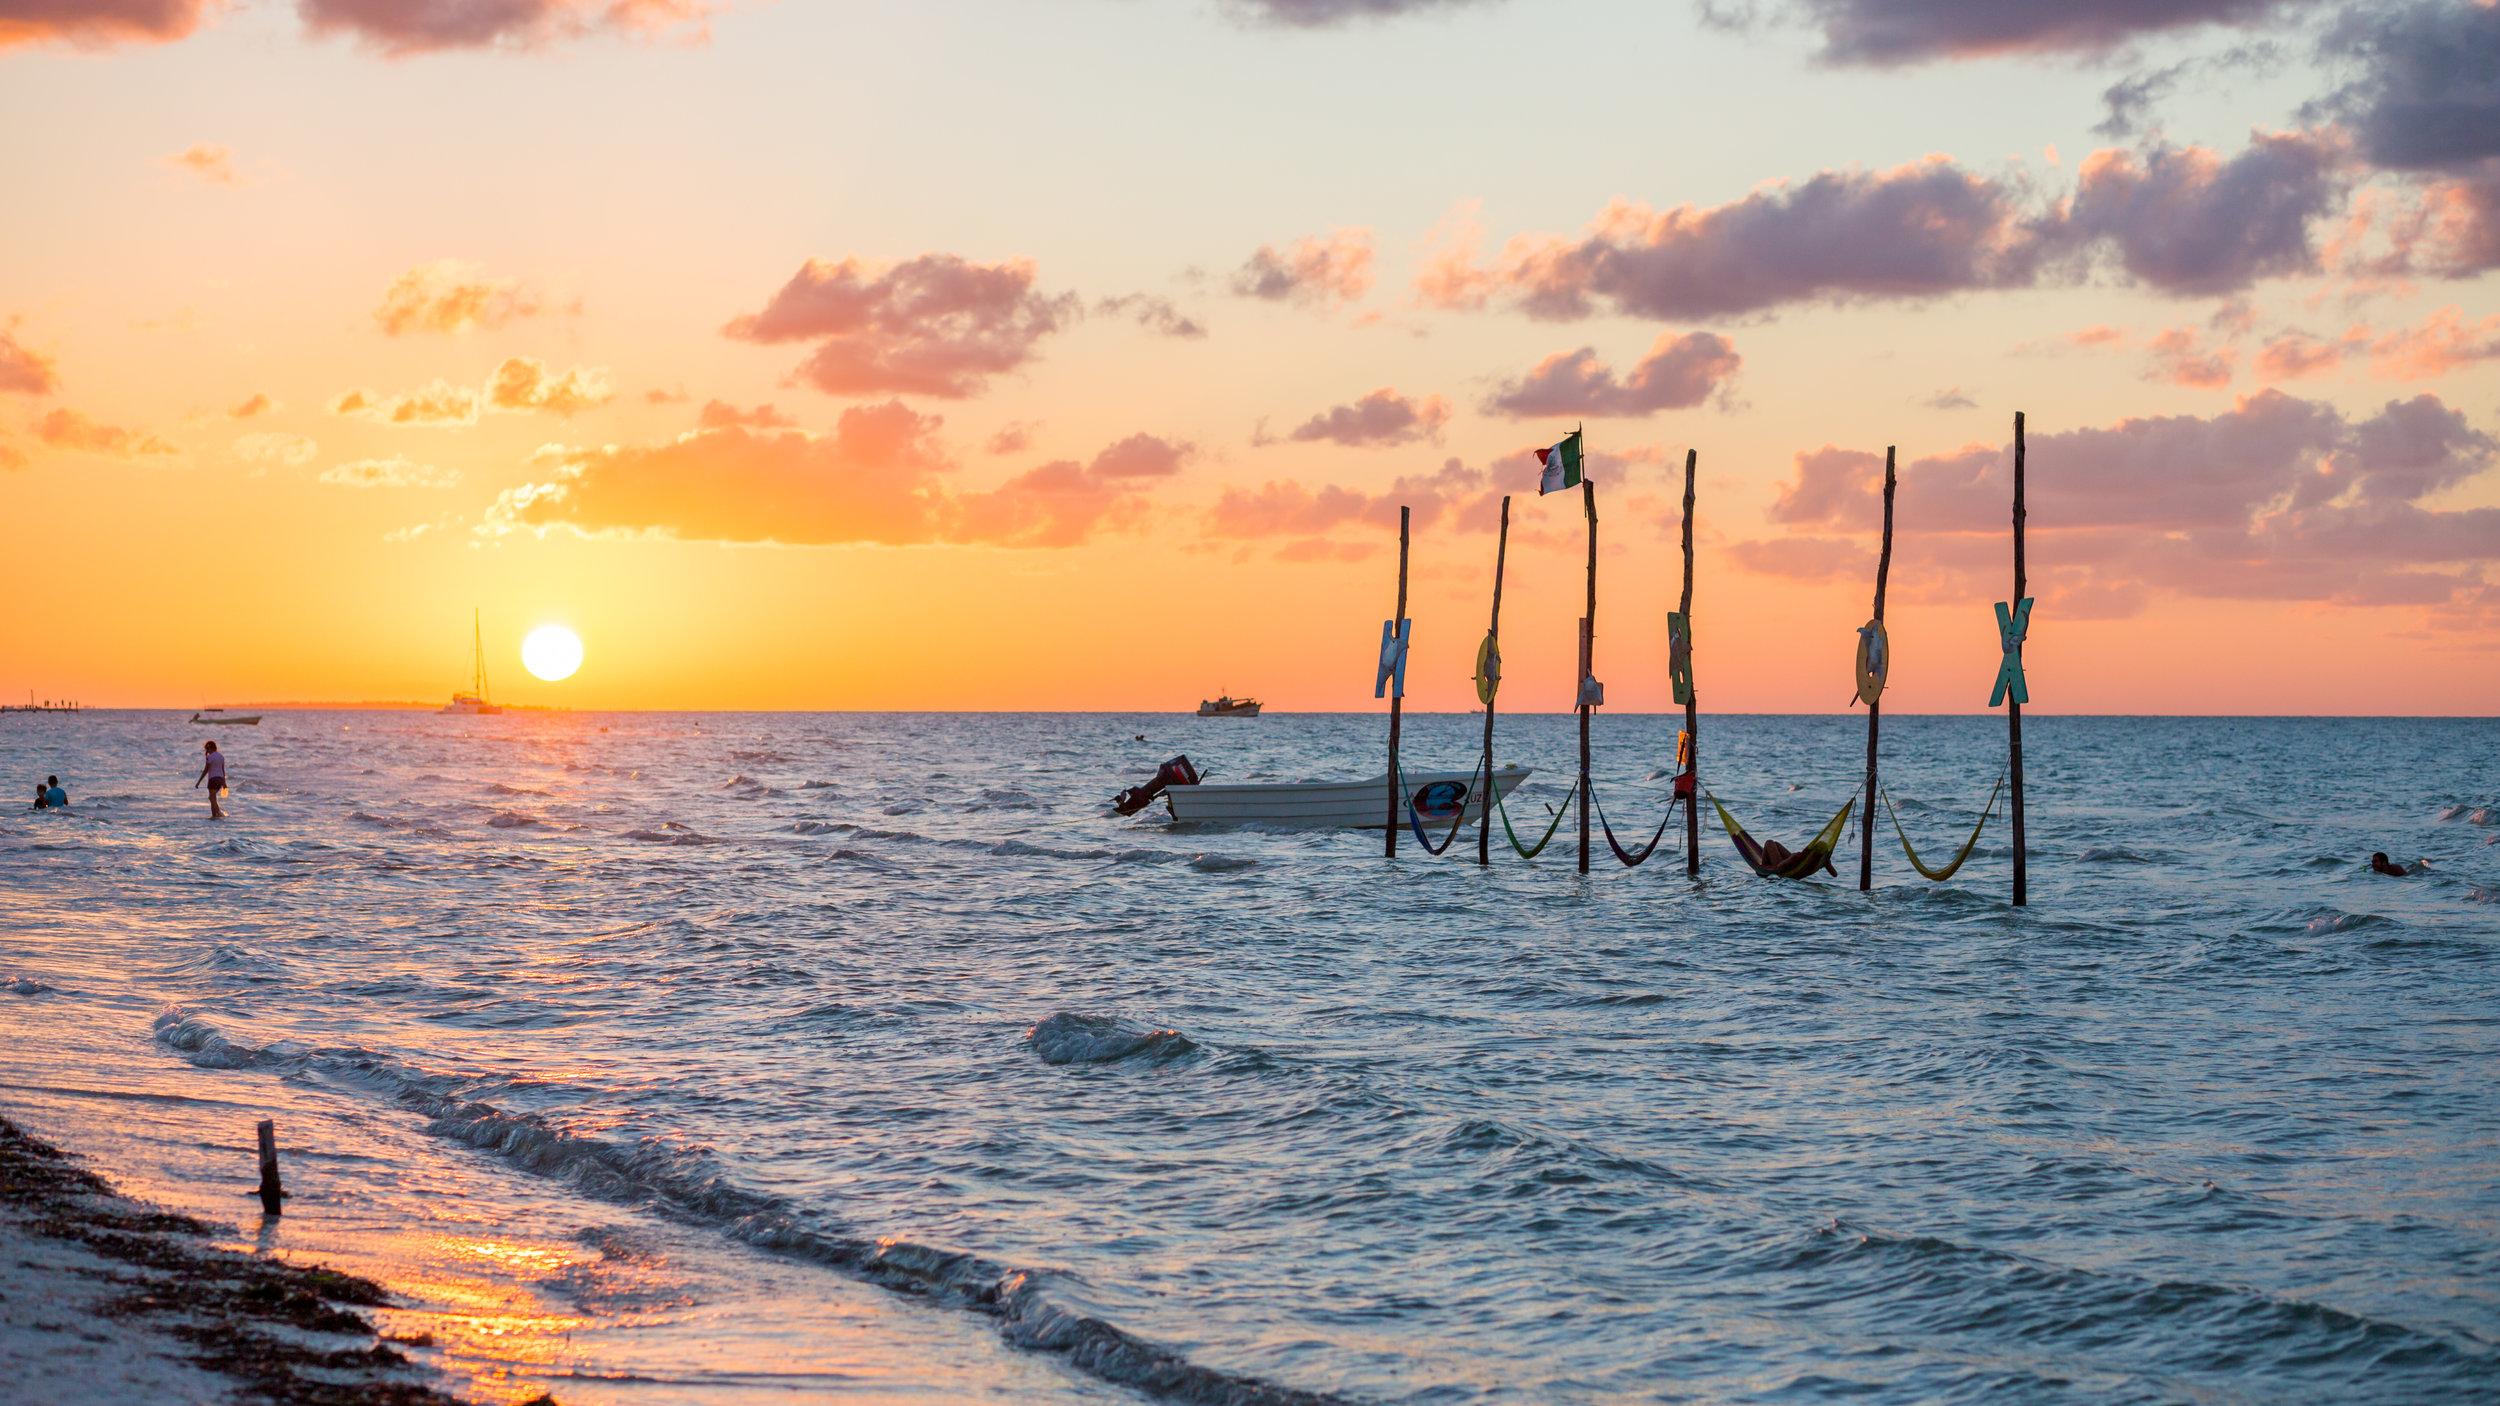 Sonnenuntergang auf der Isla Holbox